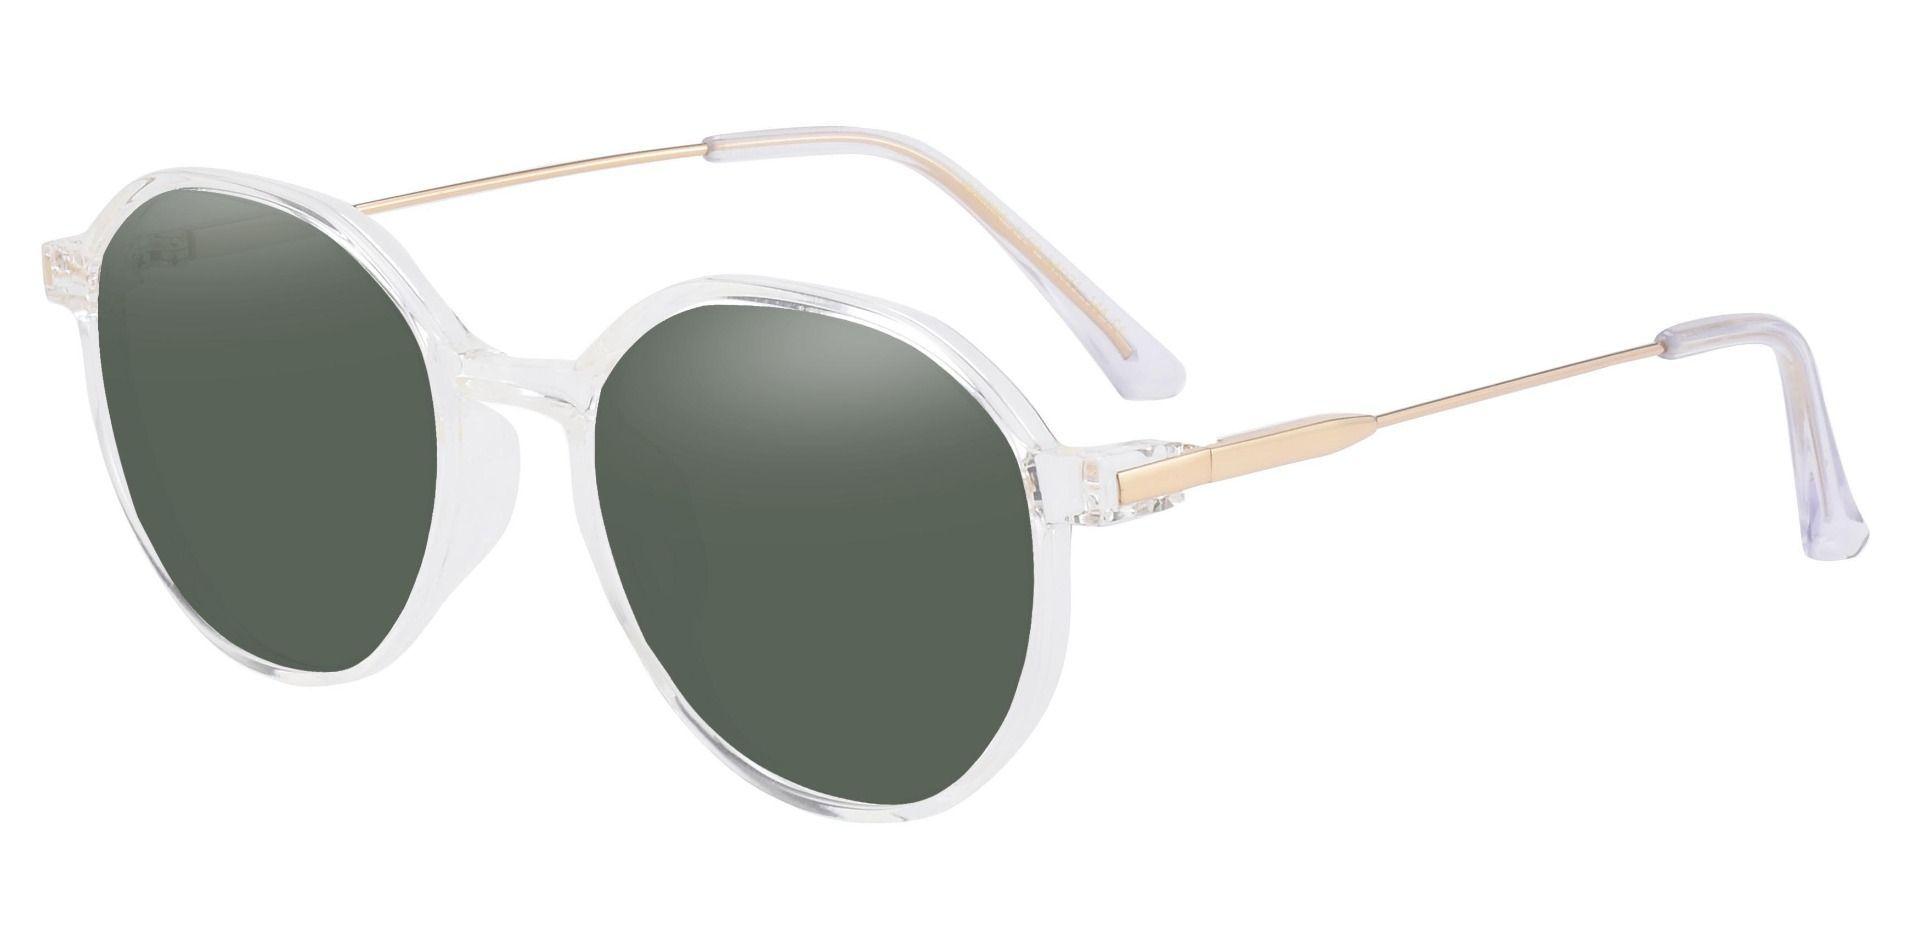 Daytona Geometric Prescription Sunglasses - Clear Frame With Green Lenses